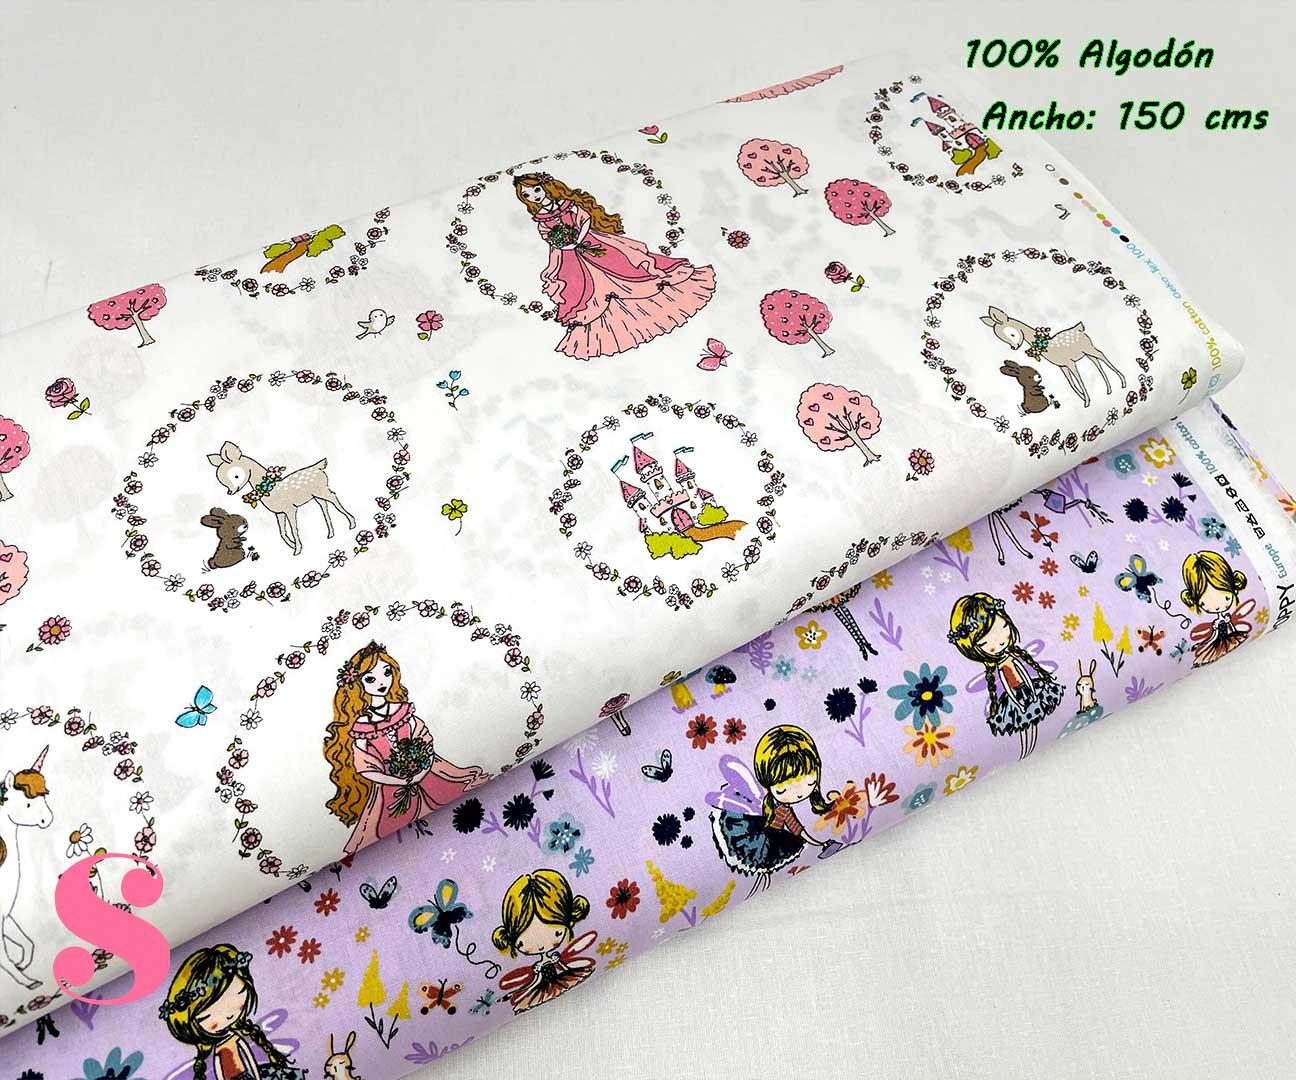 34-tela-estampada-princesas,telas-infantiles,tejidos-infantiles,Tejido Estampado Pretty Princess